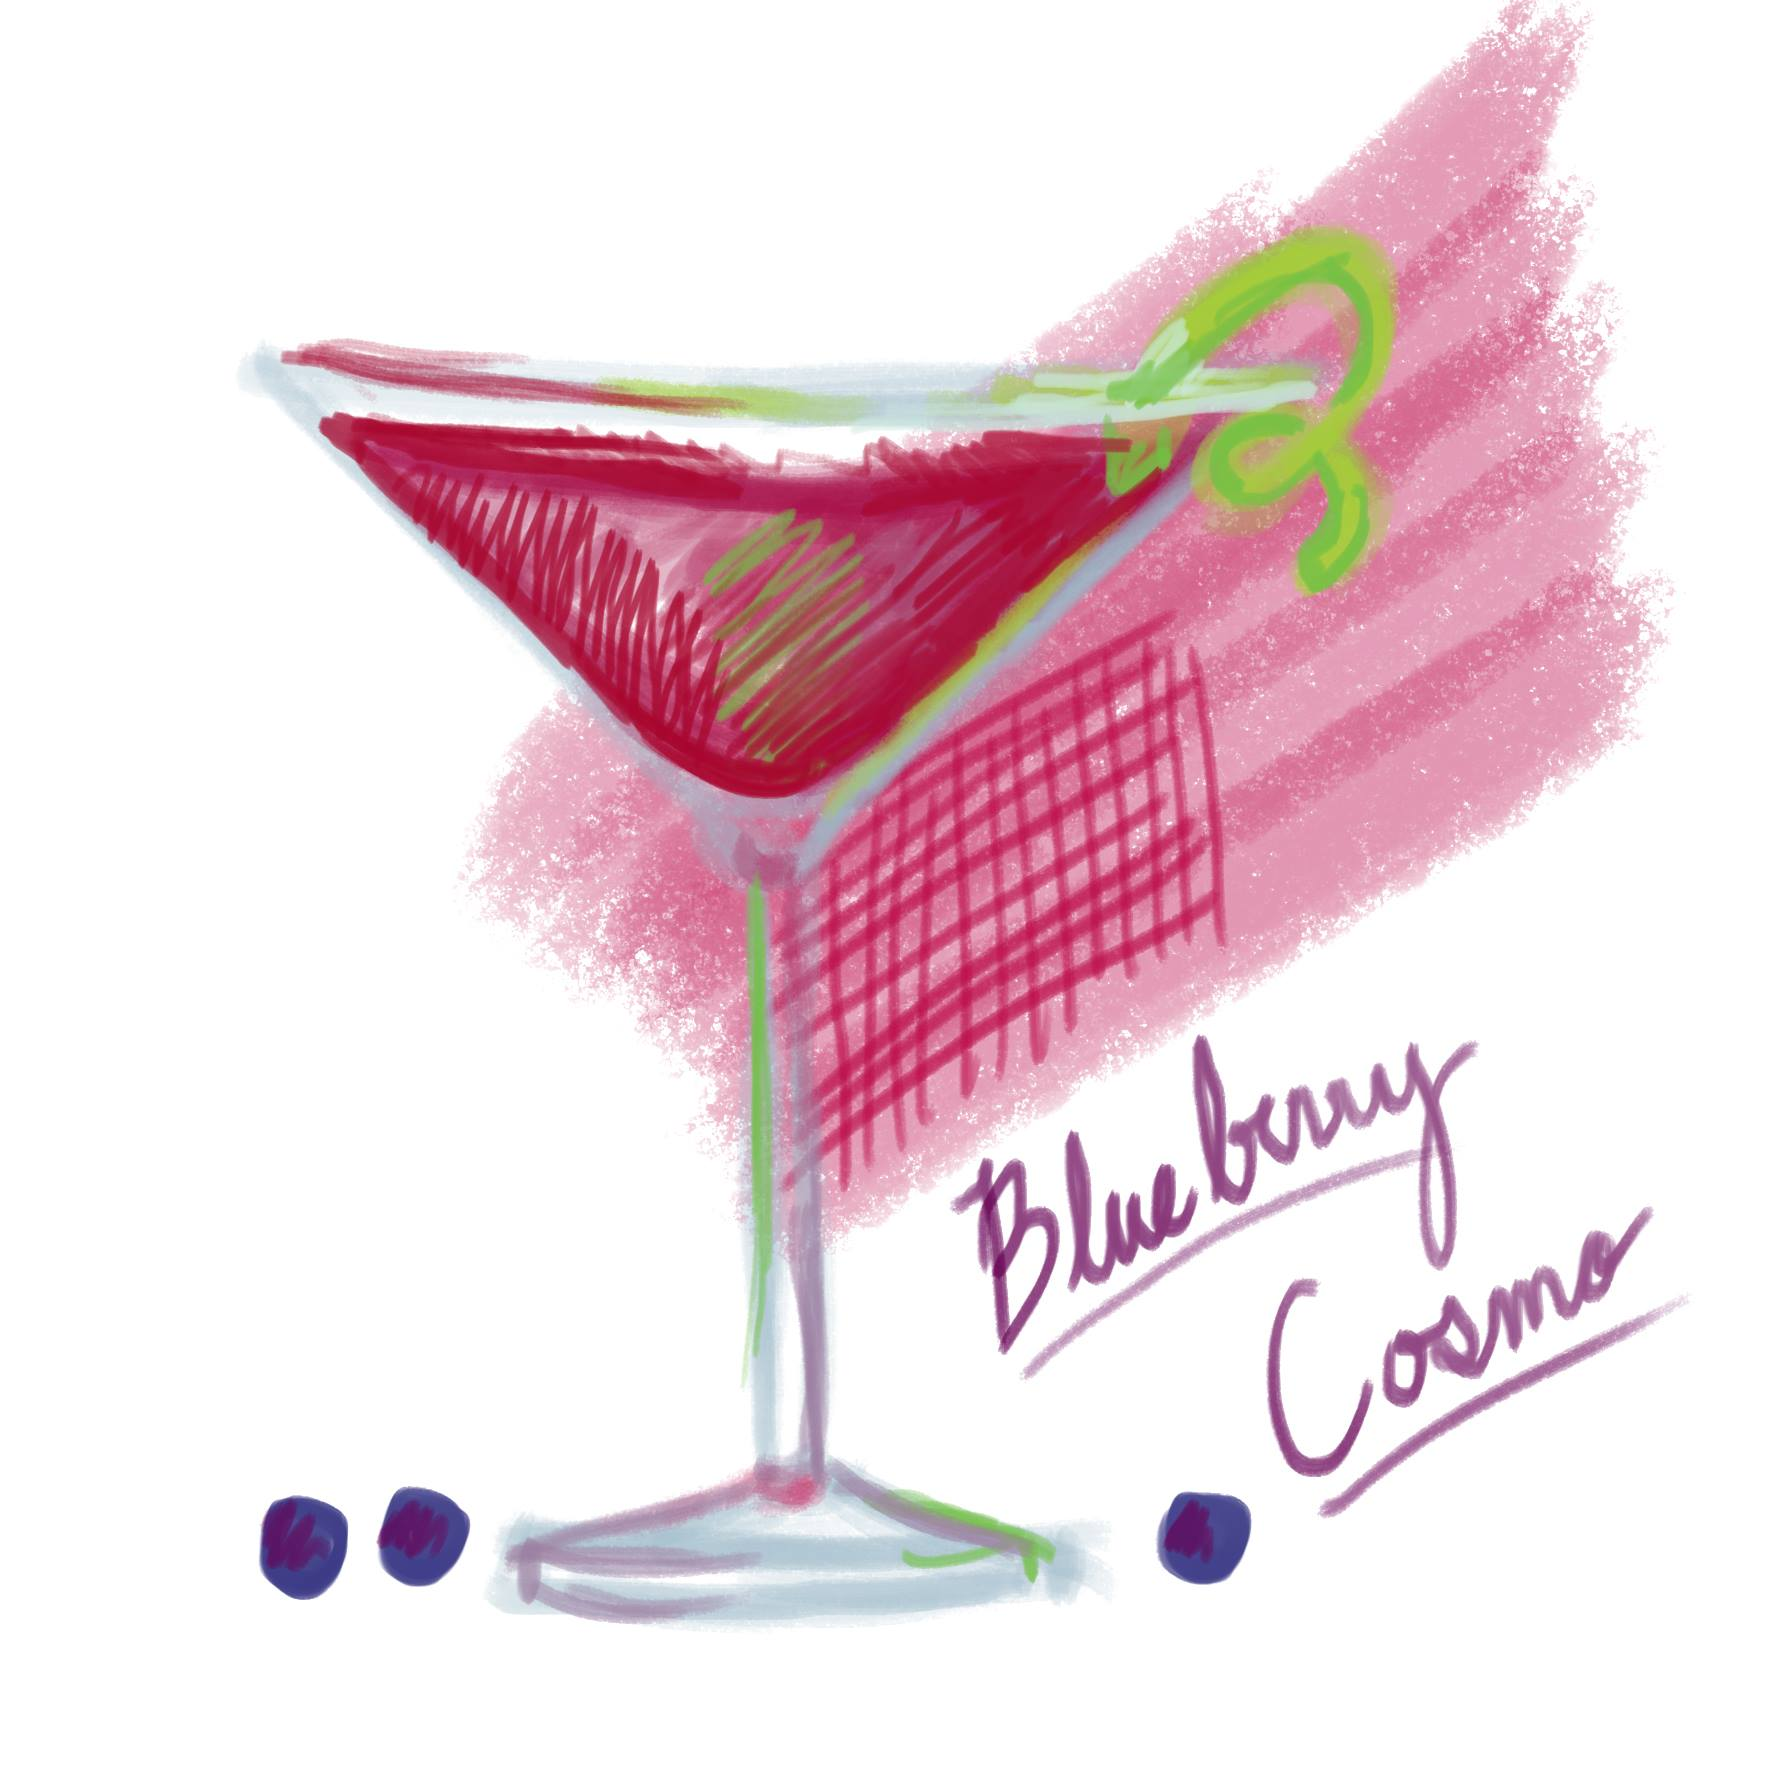 Blueberry Cosmo